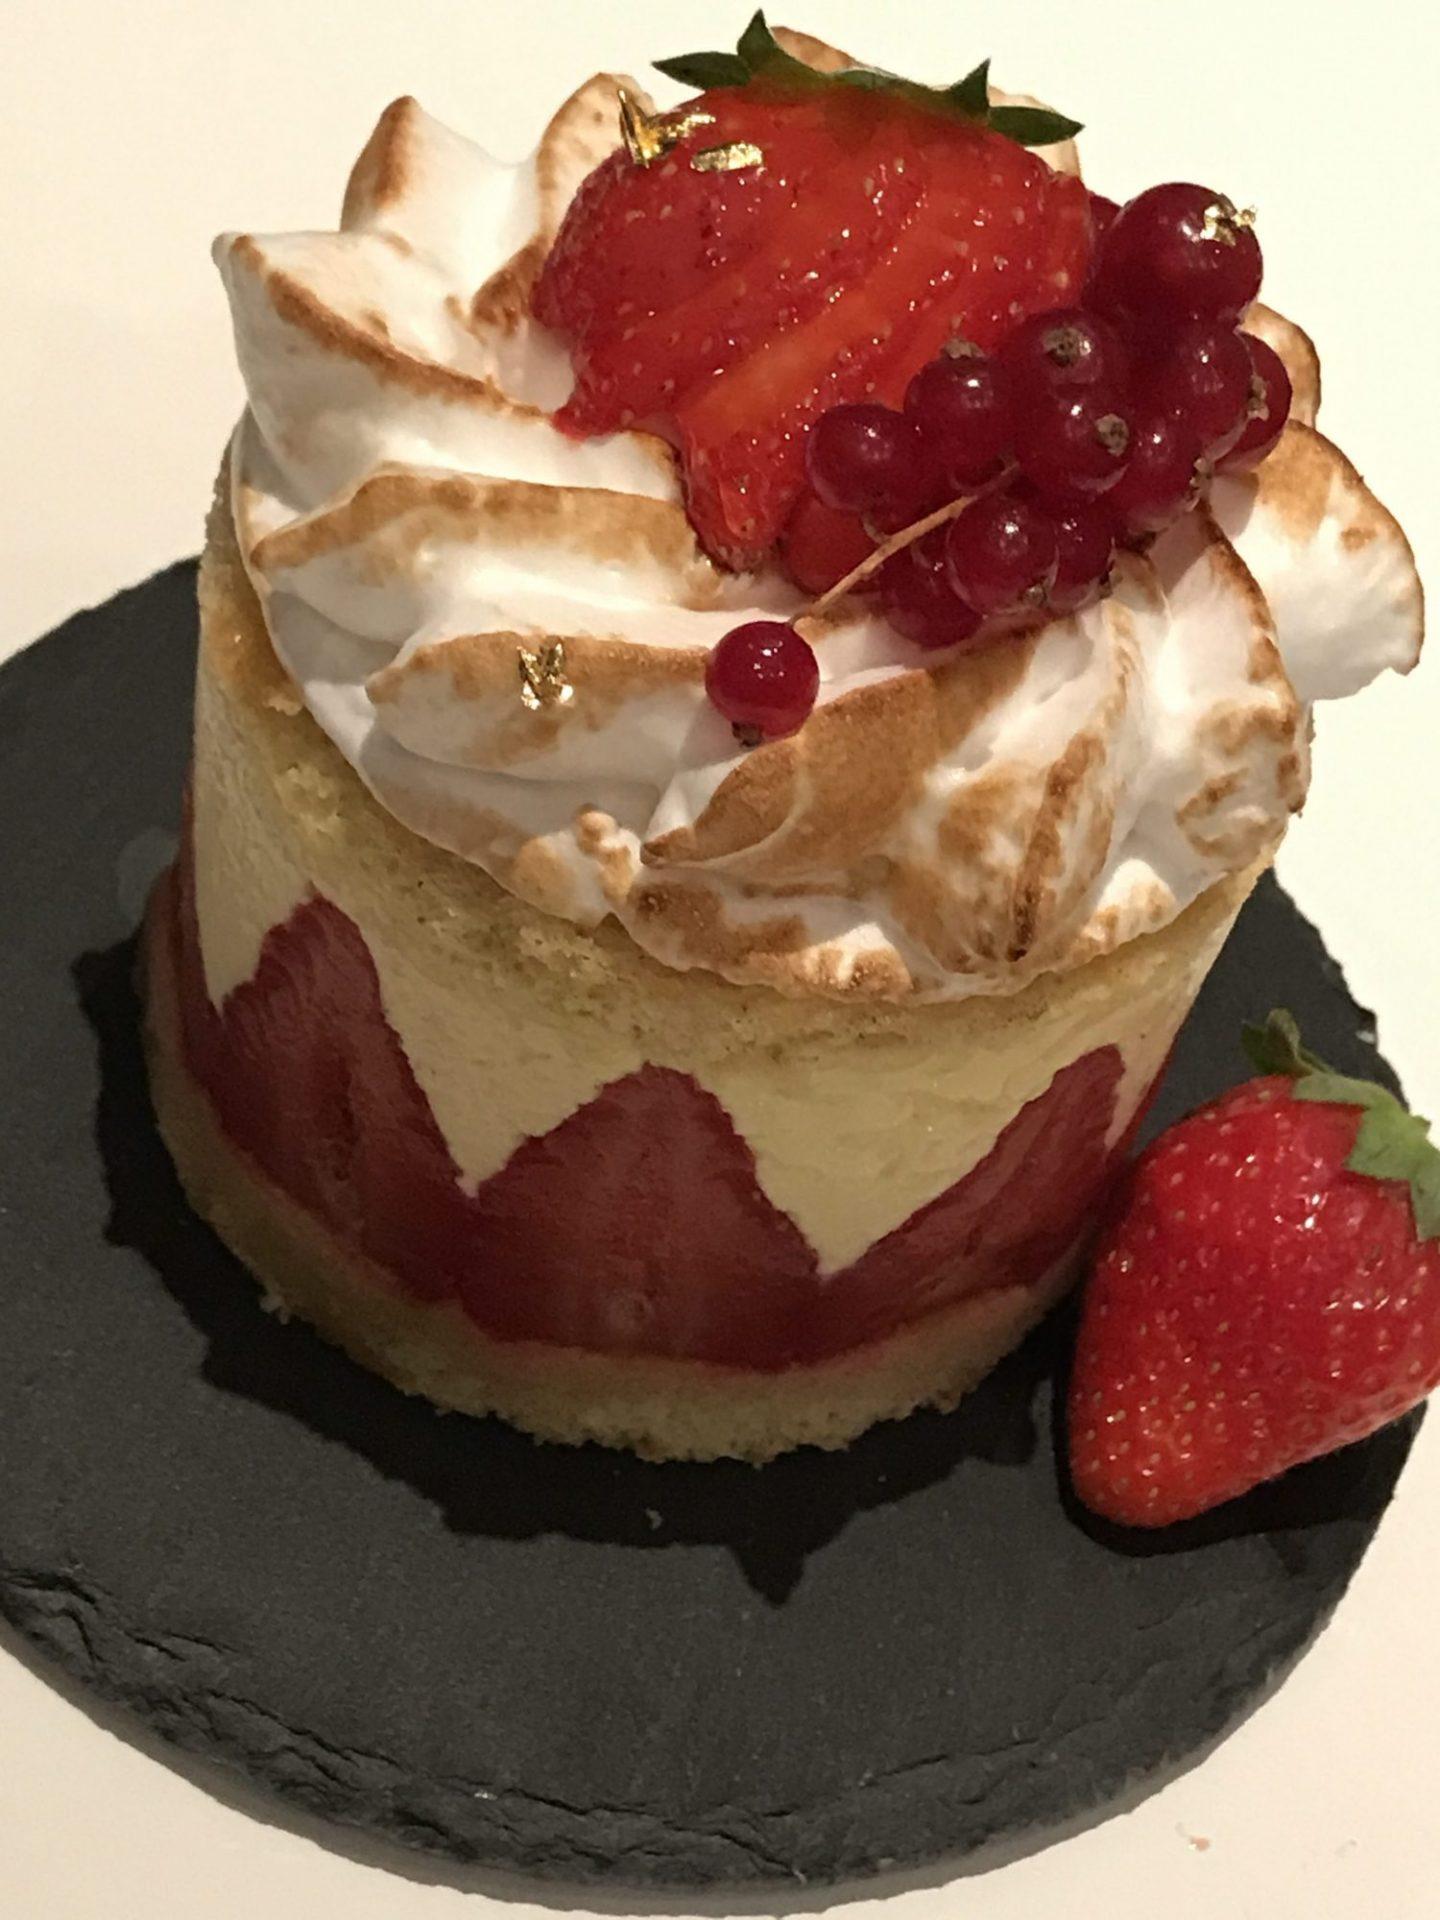 Fraisier di Pierre Hermé (torta francese di fragole)